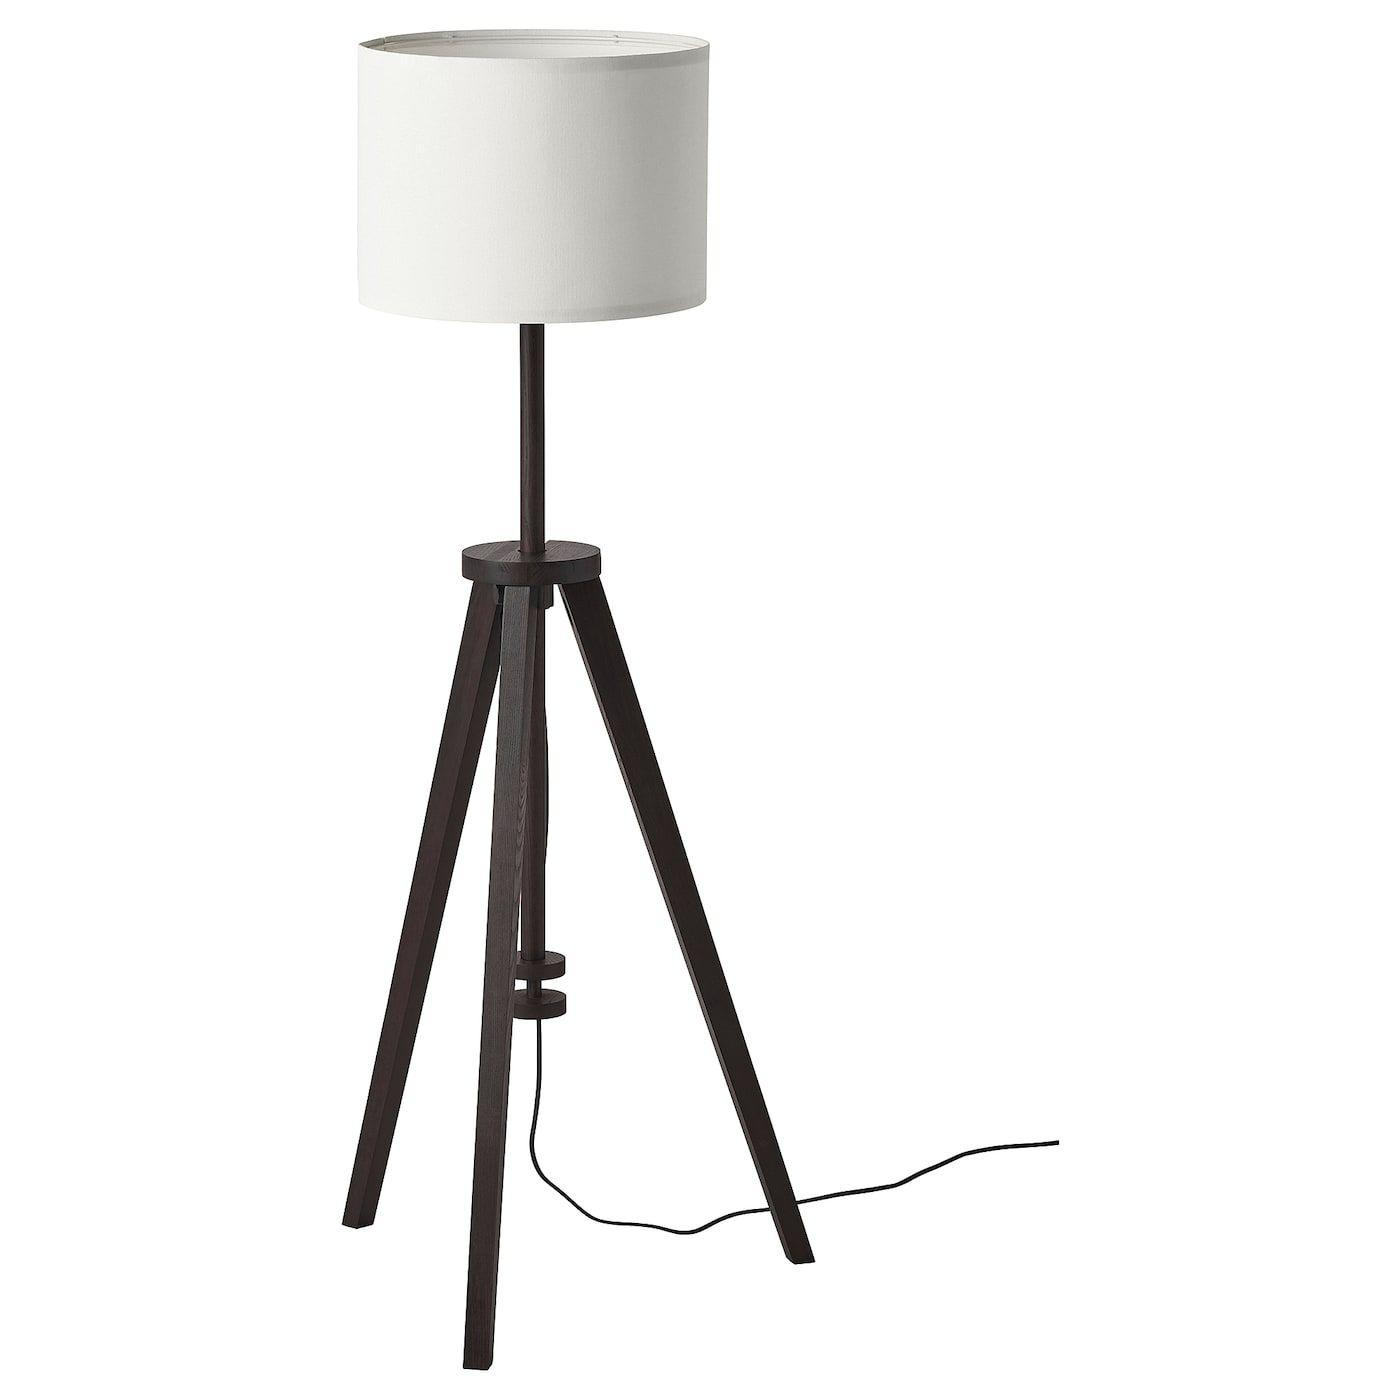 Ikea Lauters Floor Lamp Brown Ash White Floor Lamp White